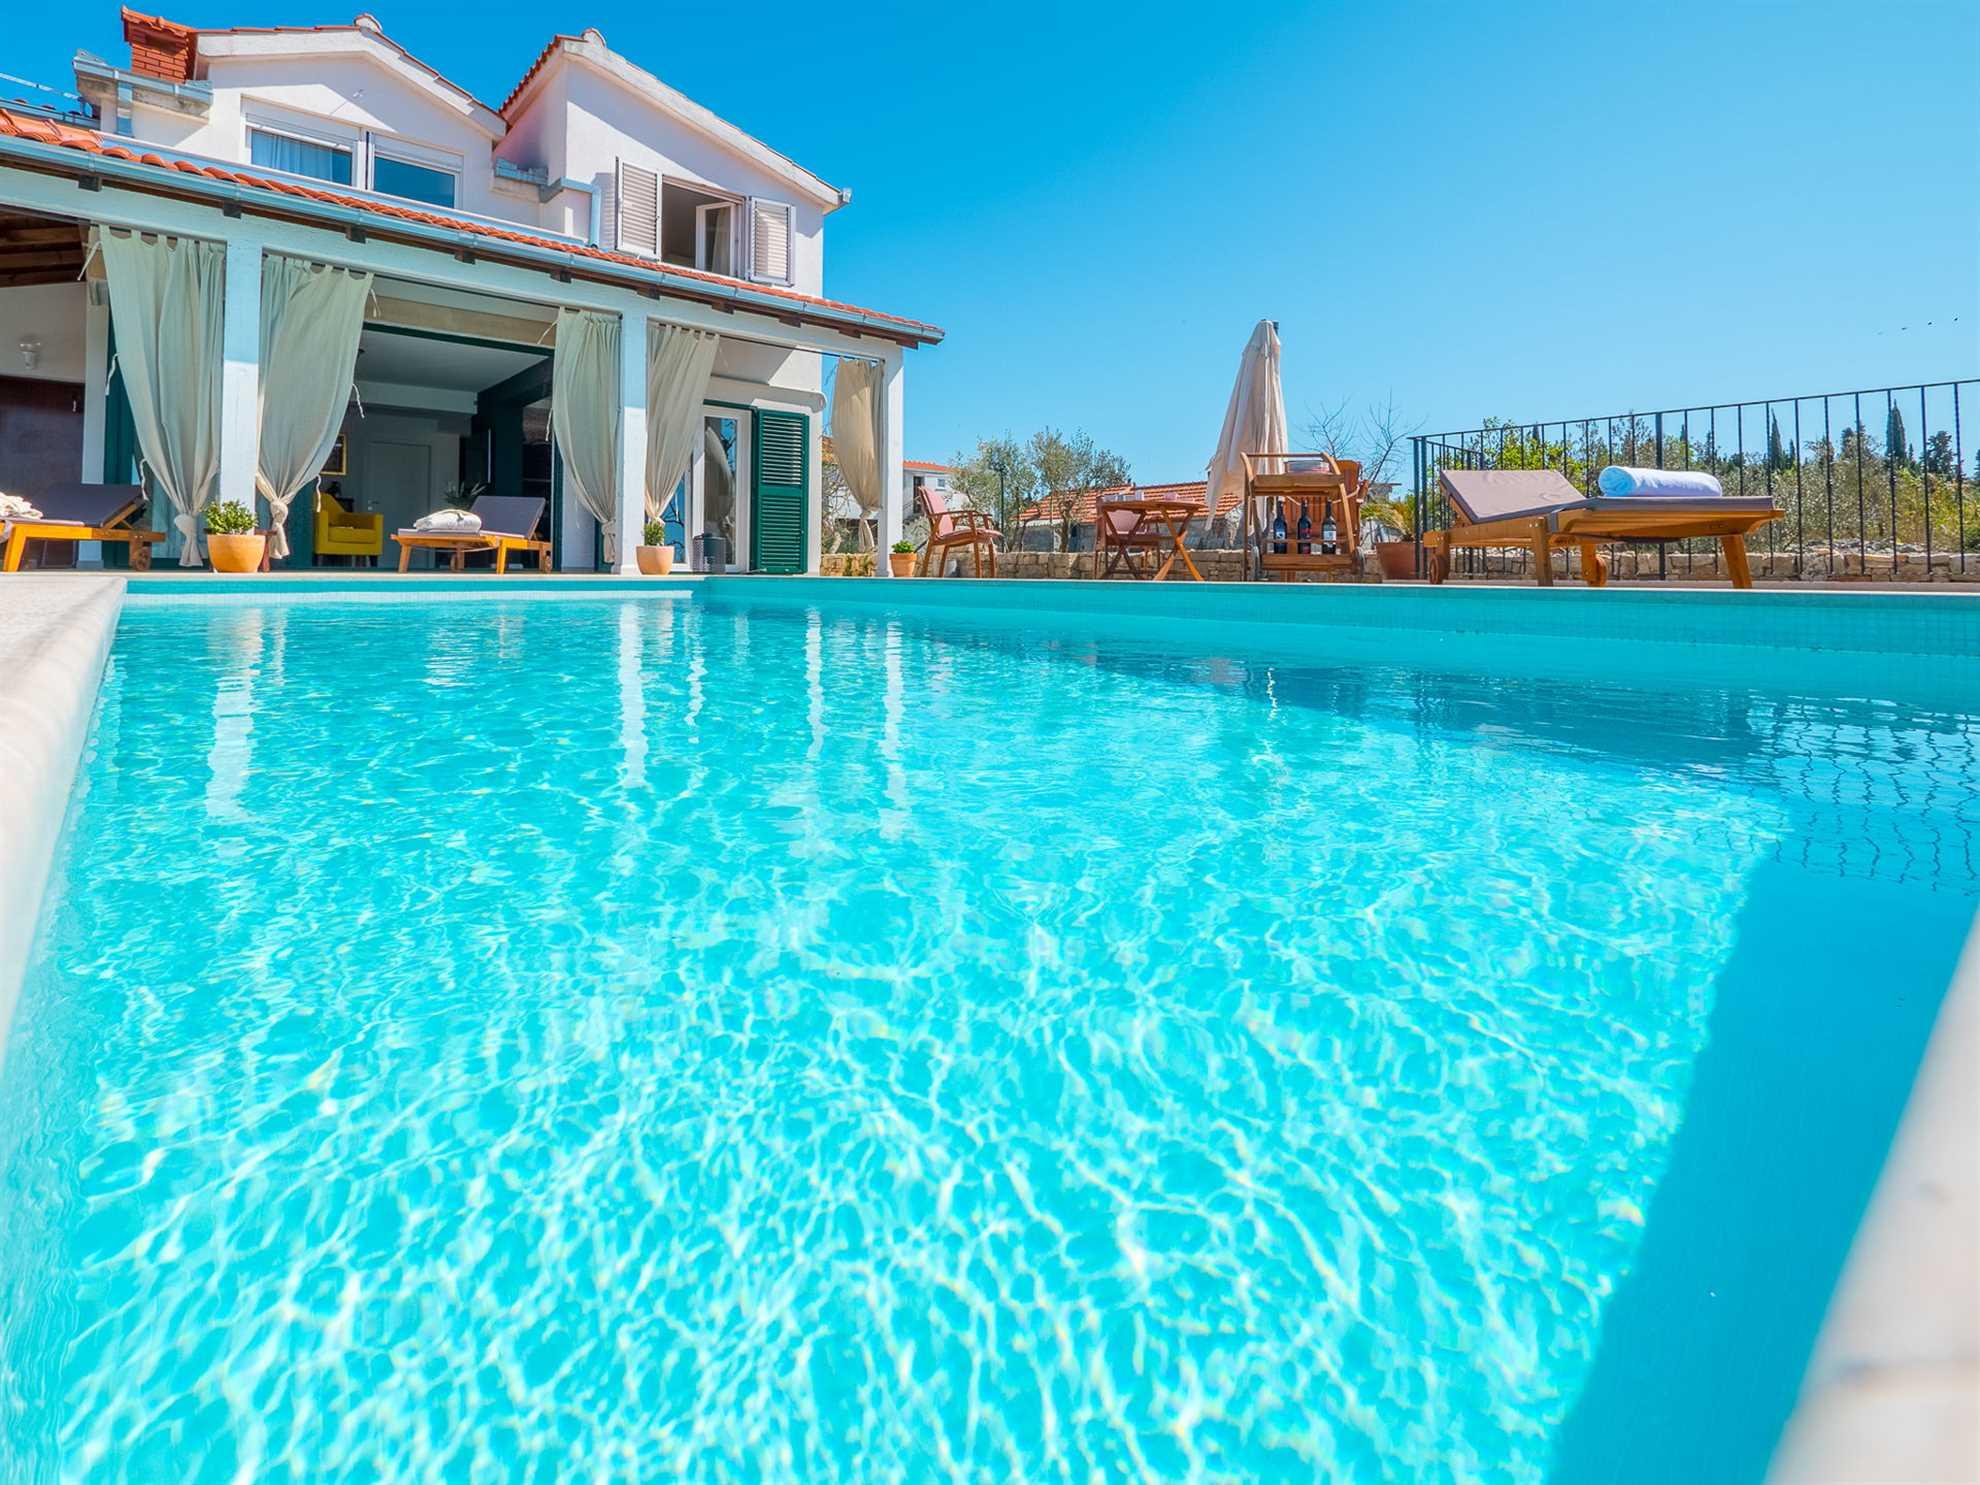 Pool in Villa Gardenia Solta